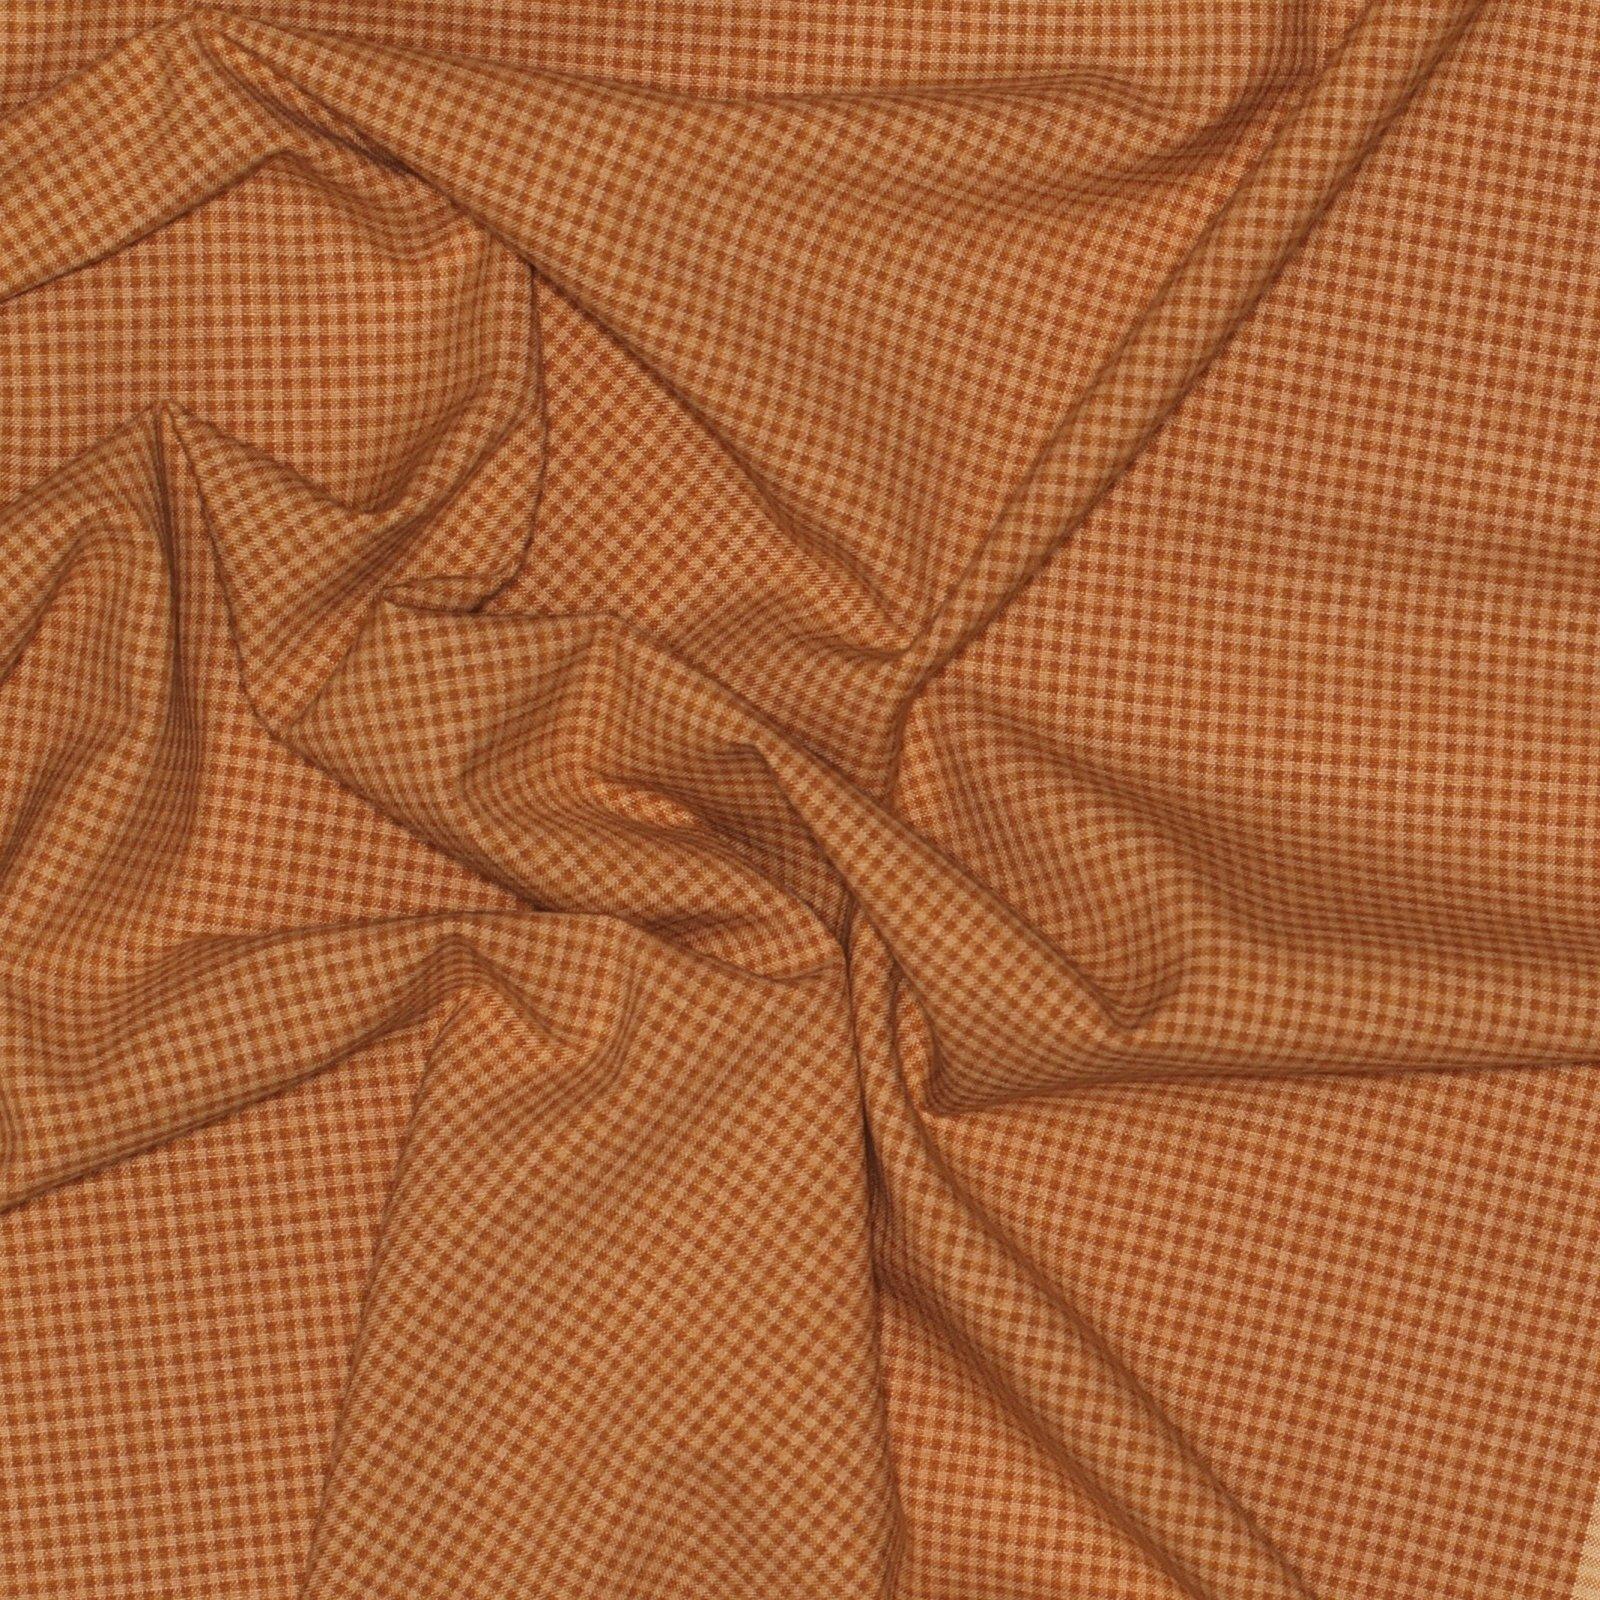 Autumn Gingham Italian Wool/Cotton/Silk Blend; 58